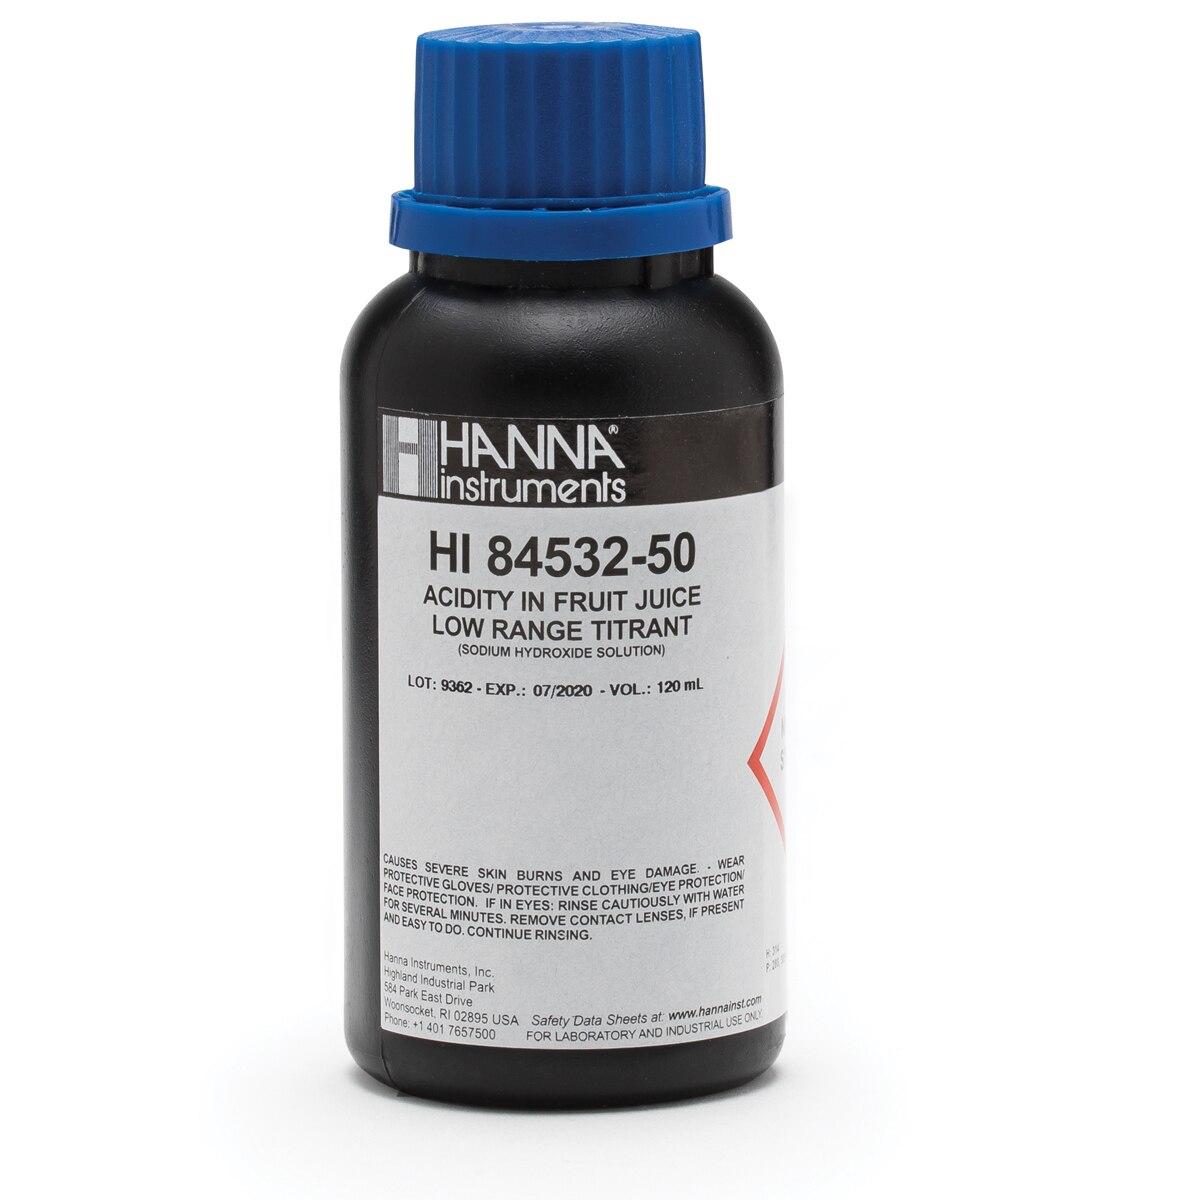 Titulante de Rango Bajo para Acidez Titulable en Mini Titulador para Jugo de Fruta (120 mL) - HI84532-50